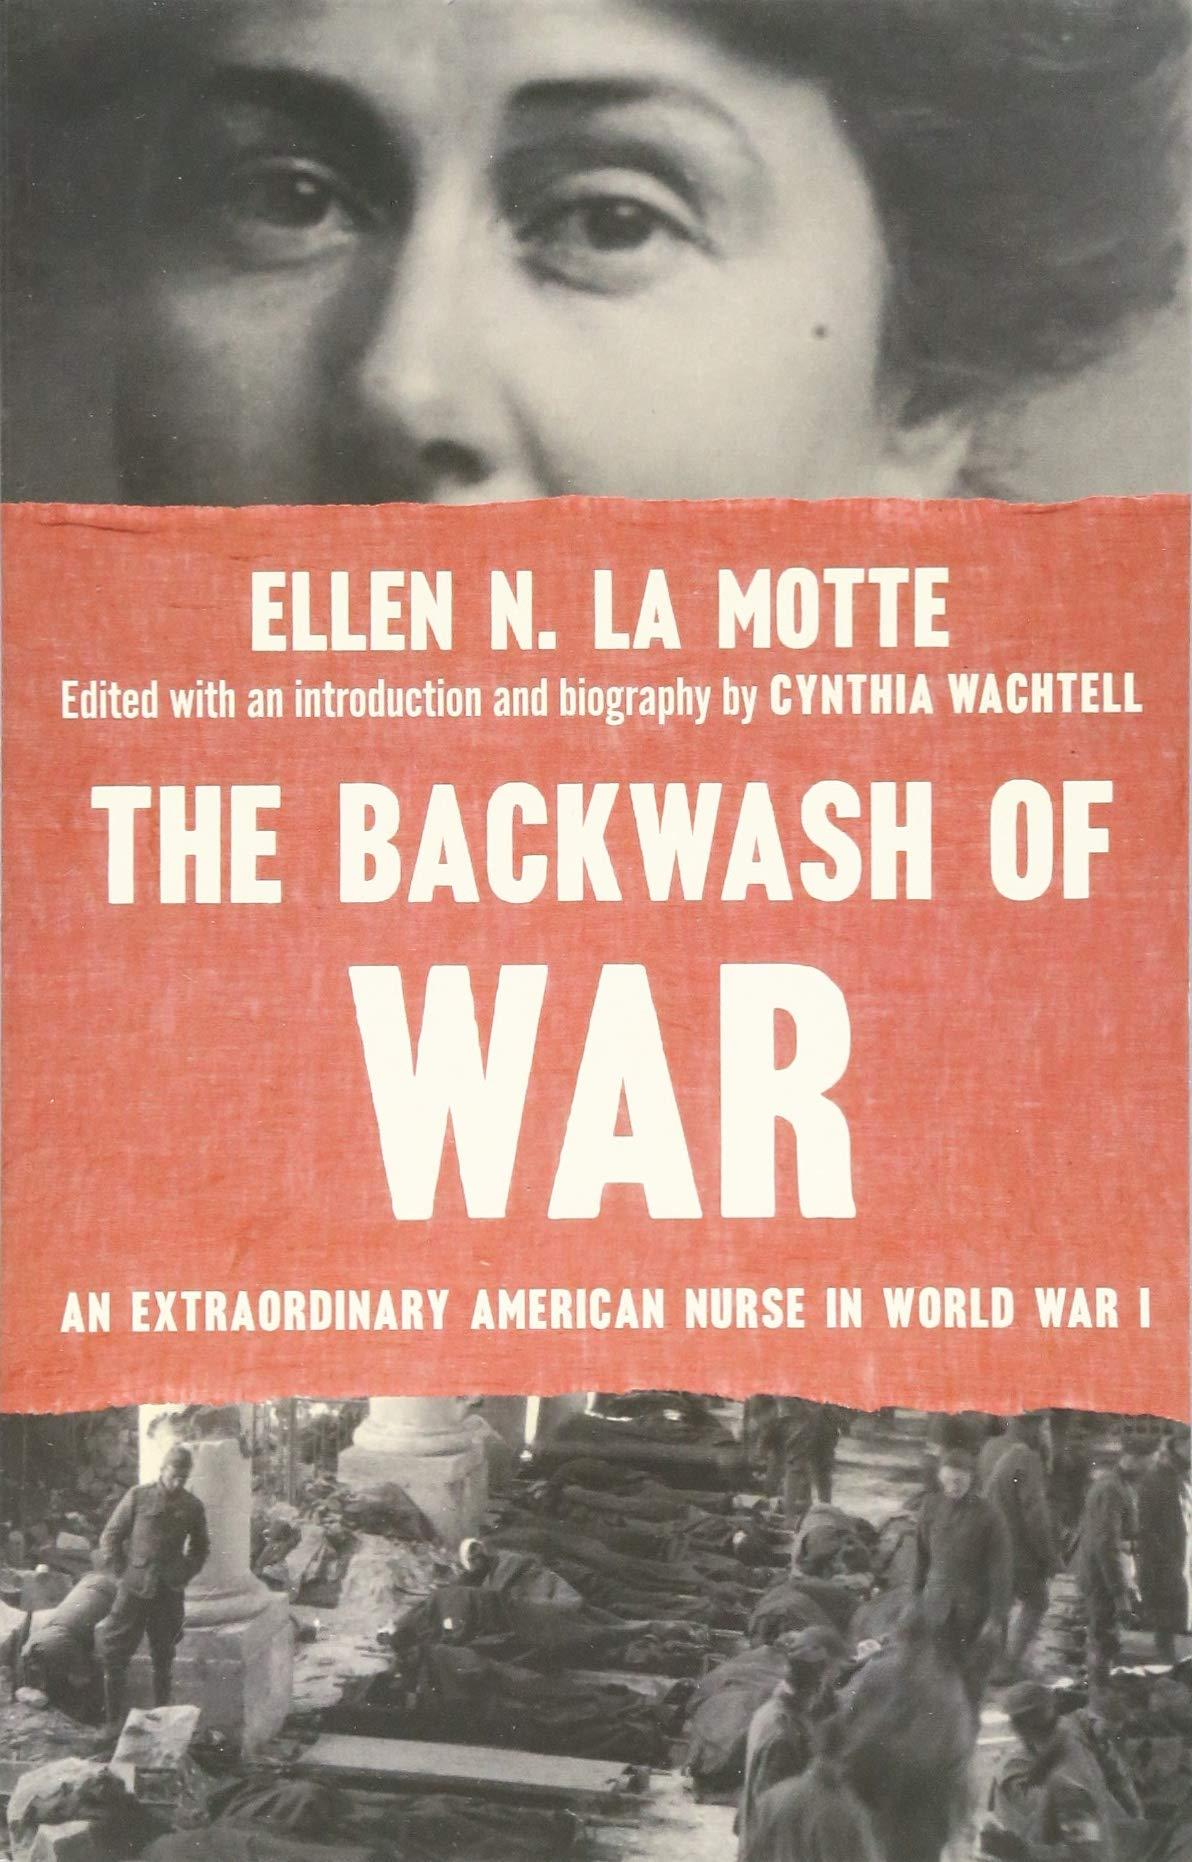 The Backwash Of War  An Extraordinary American Nurse In World War I